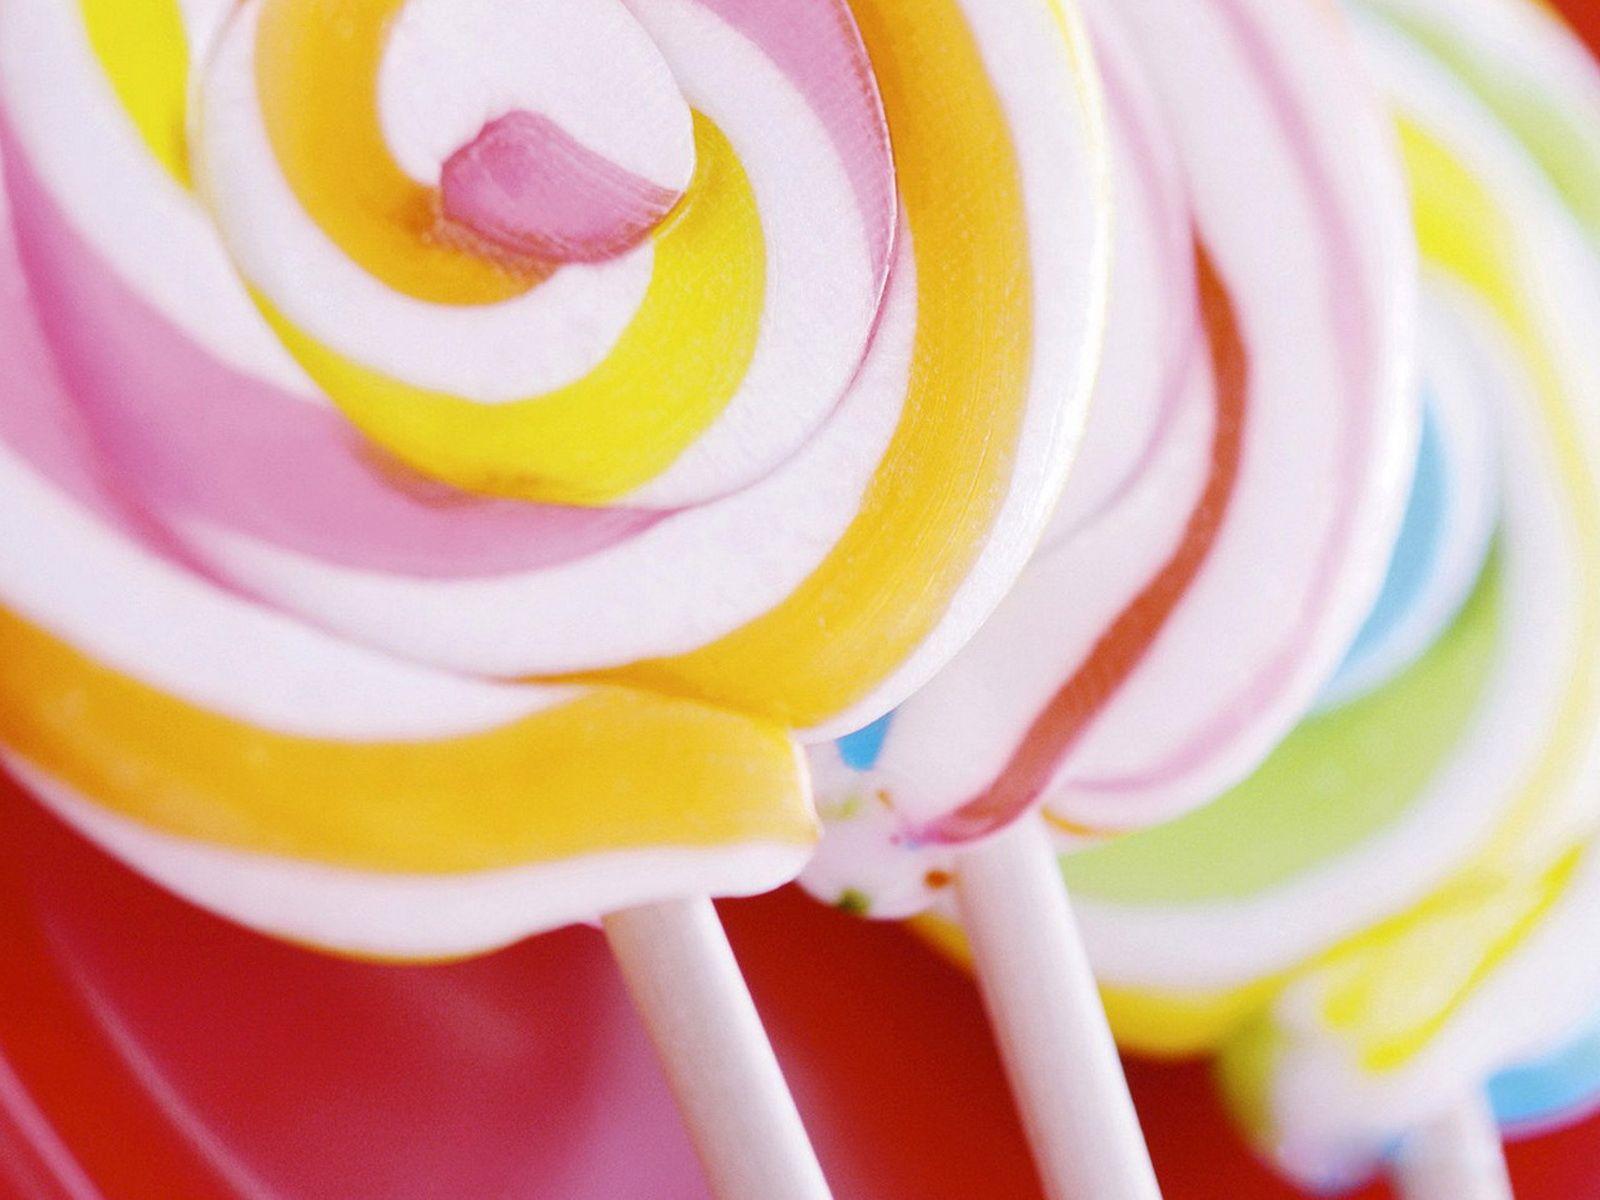 Candies Lollipop Confection Sweet Candy